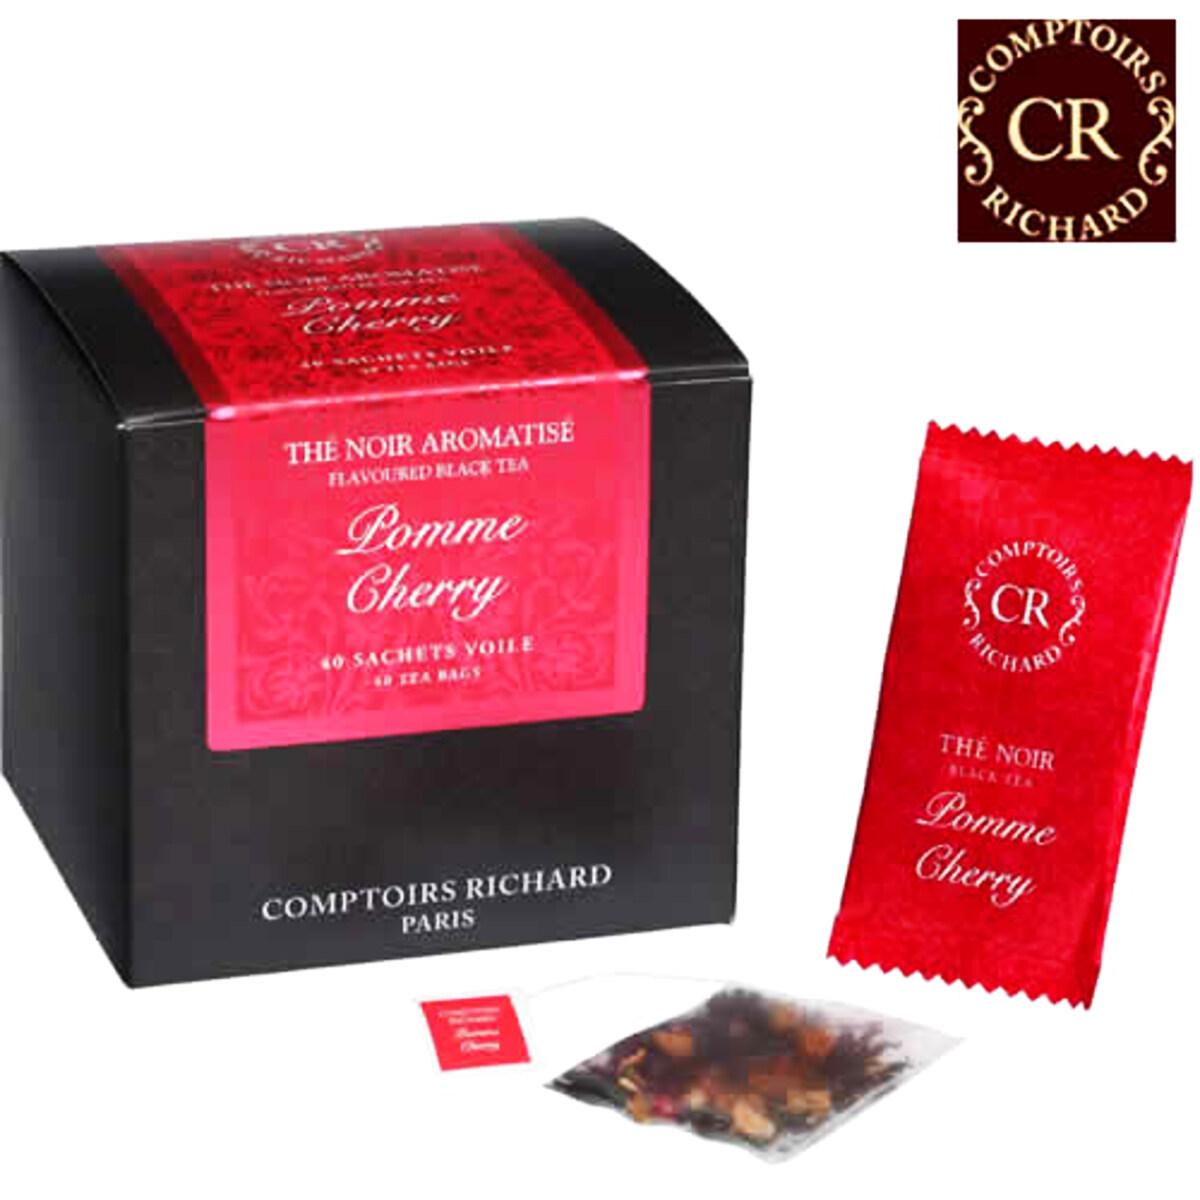 Comptoirs Richard Pomme Cherry - 40 τεμάχια φακελάκια μαύρο τσάι φρούτων μήλο και κεράσι